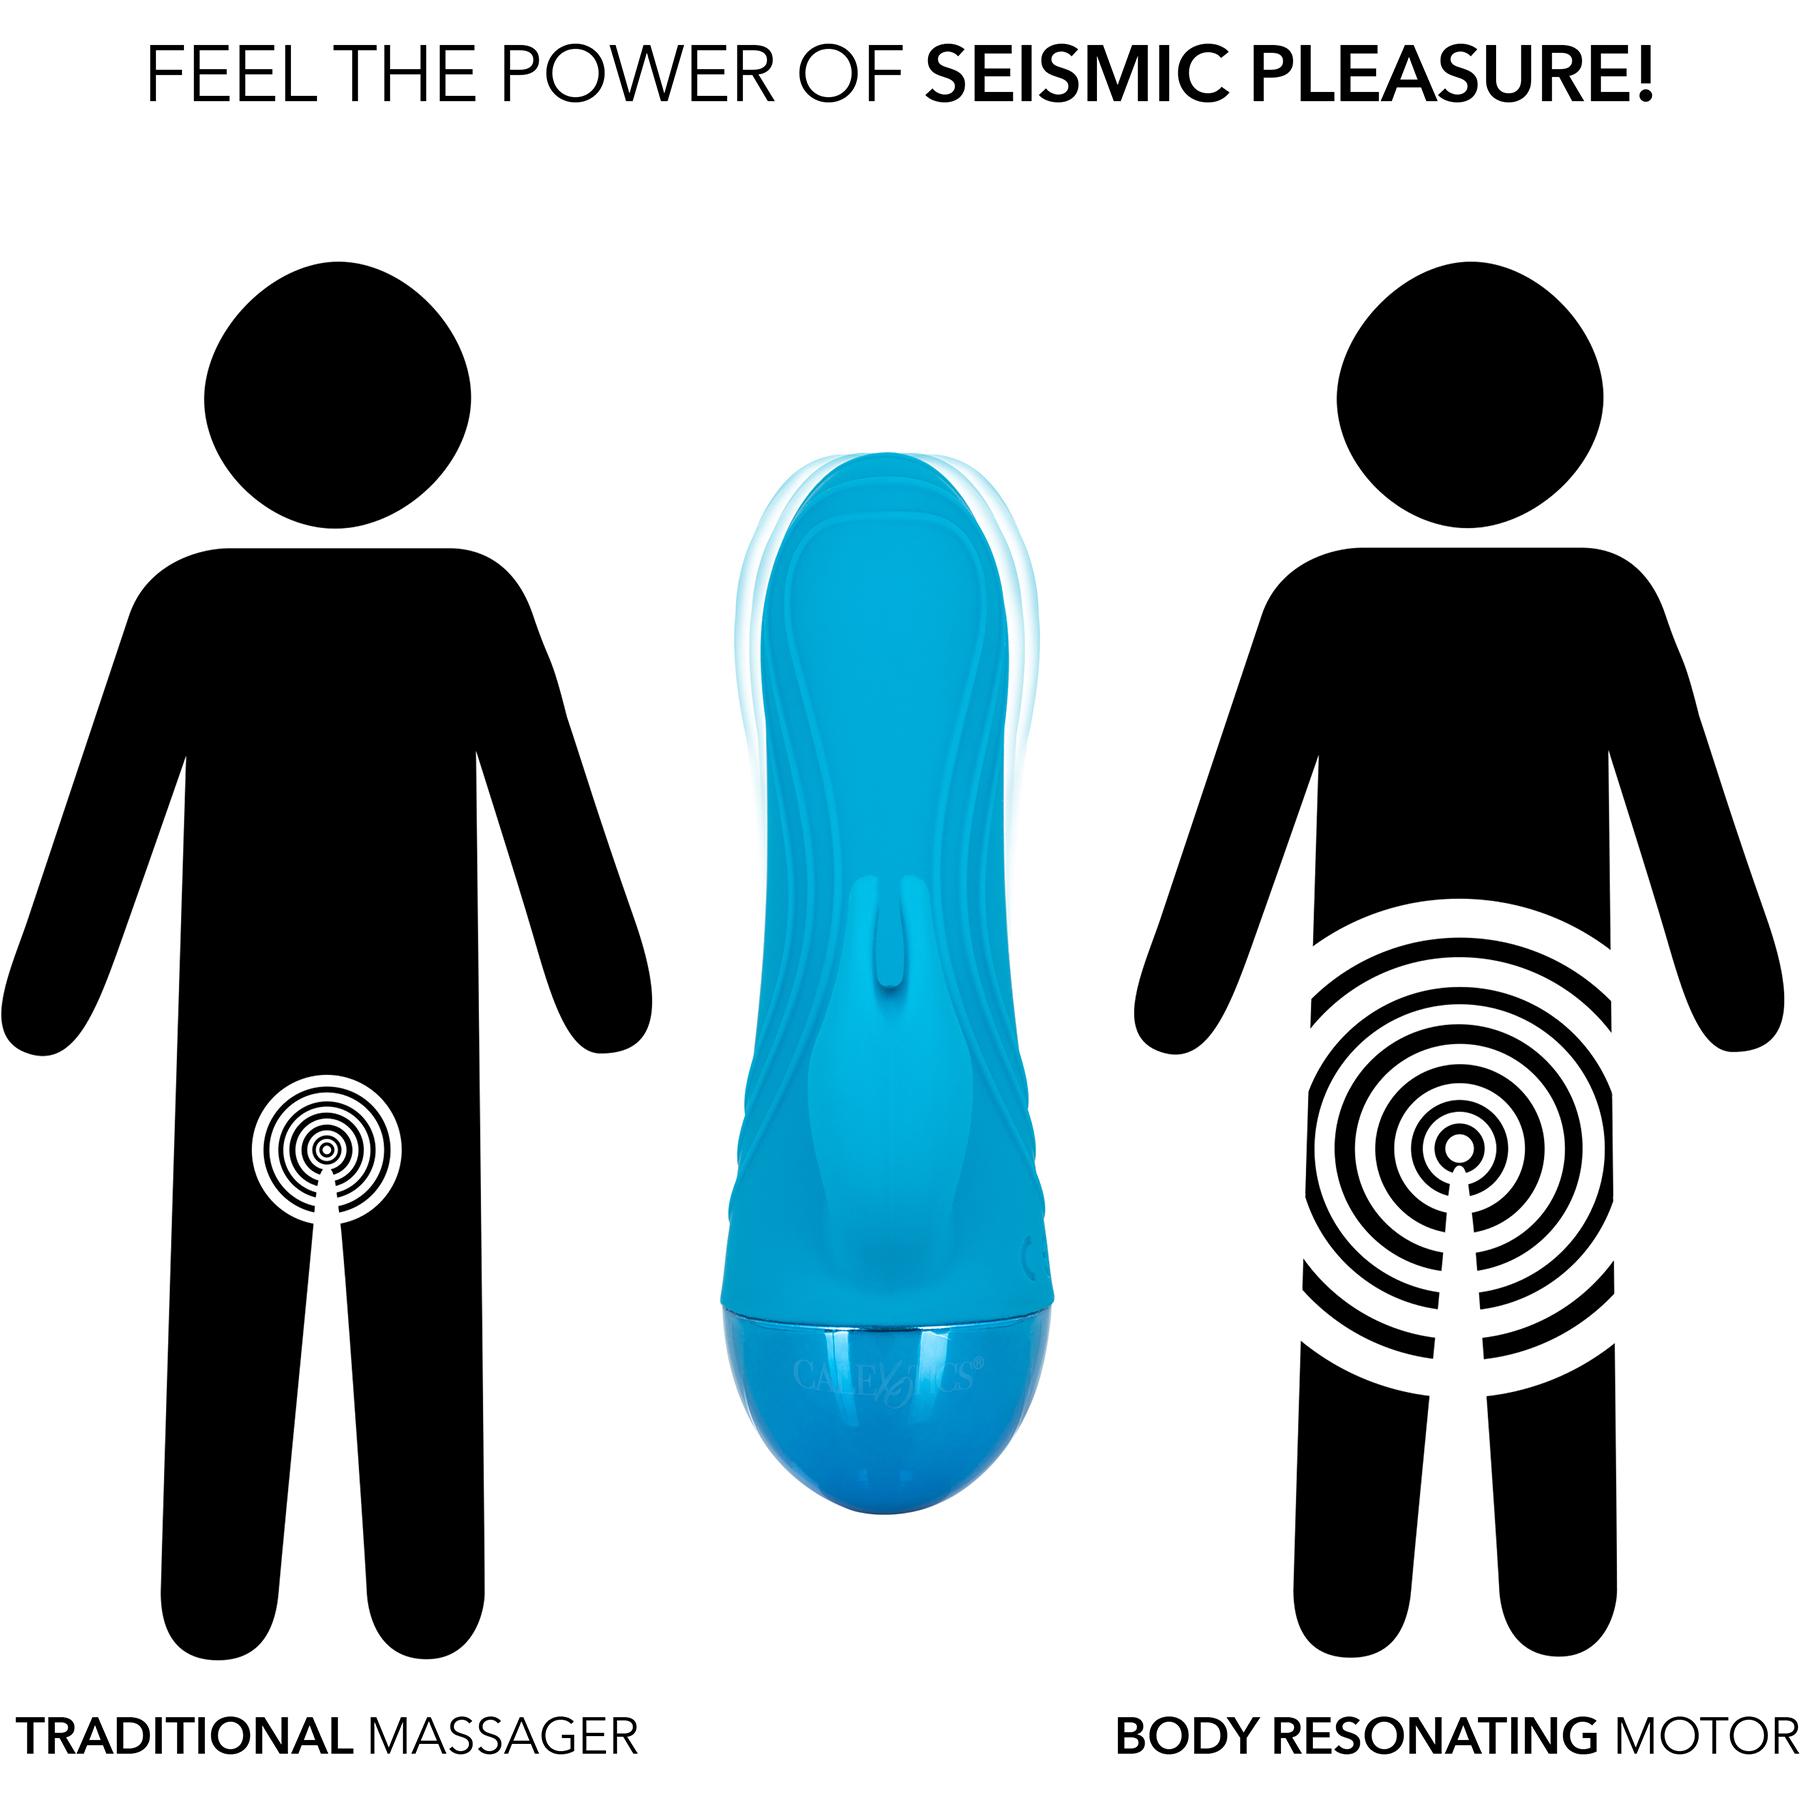 Tremble Please Waterproof Rechargeable Silicone Seismic Rabbit Style Vibrator - Comparison